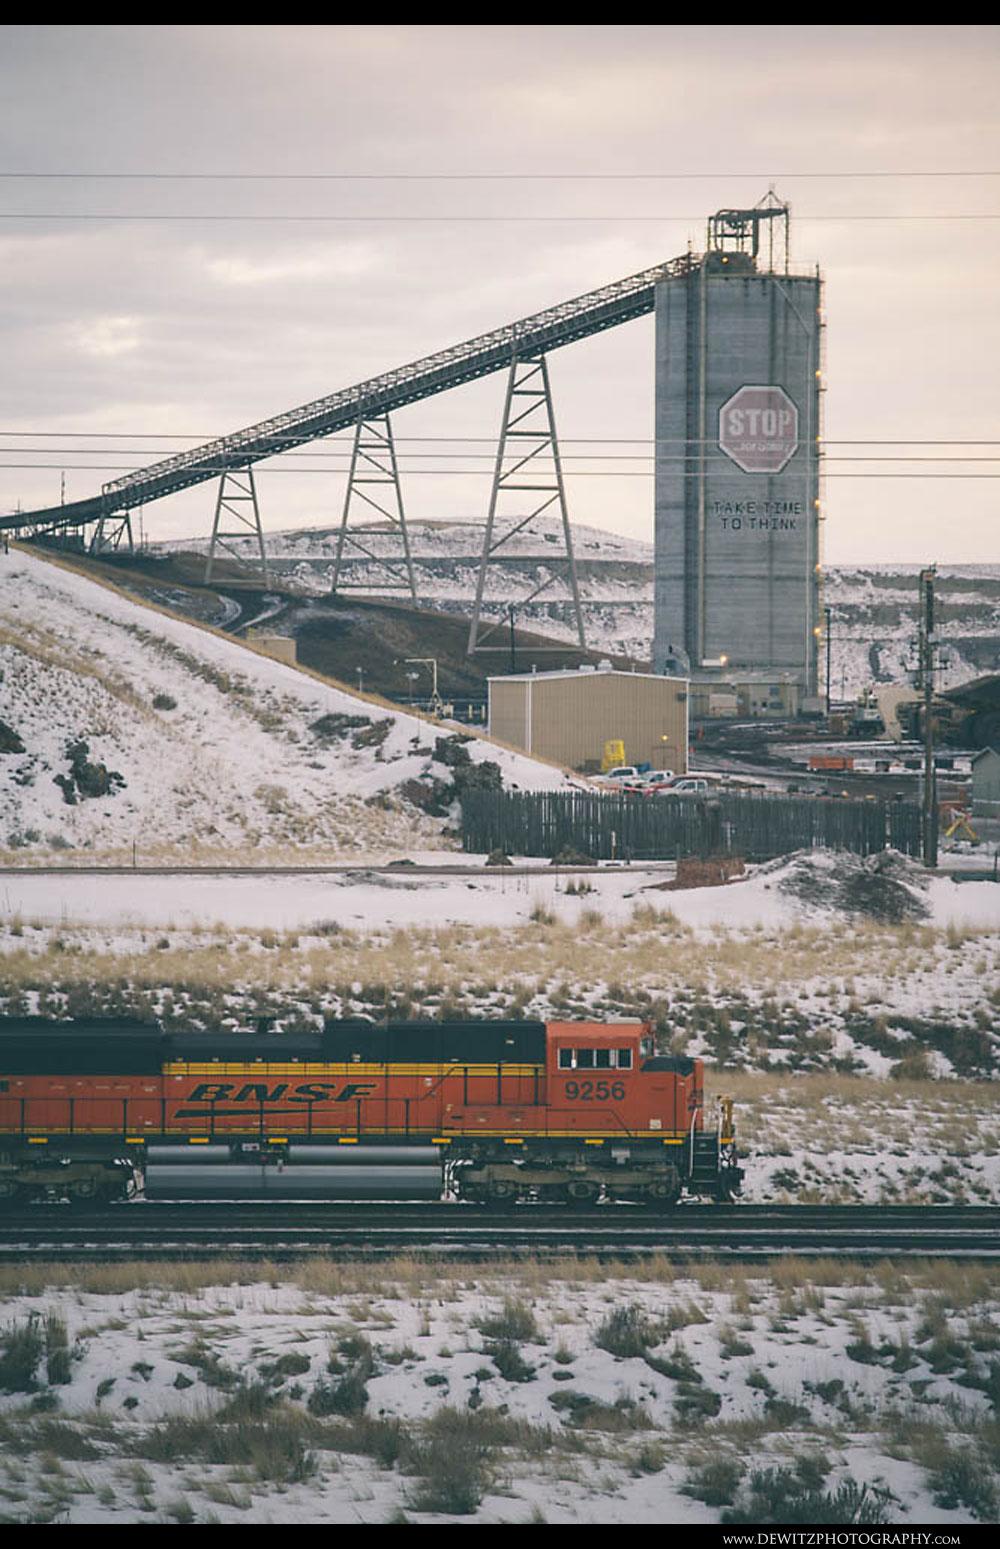 325BNSF Coal train Arrives at the Northern Rawhide Mine